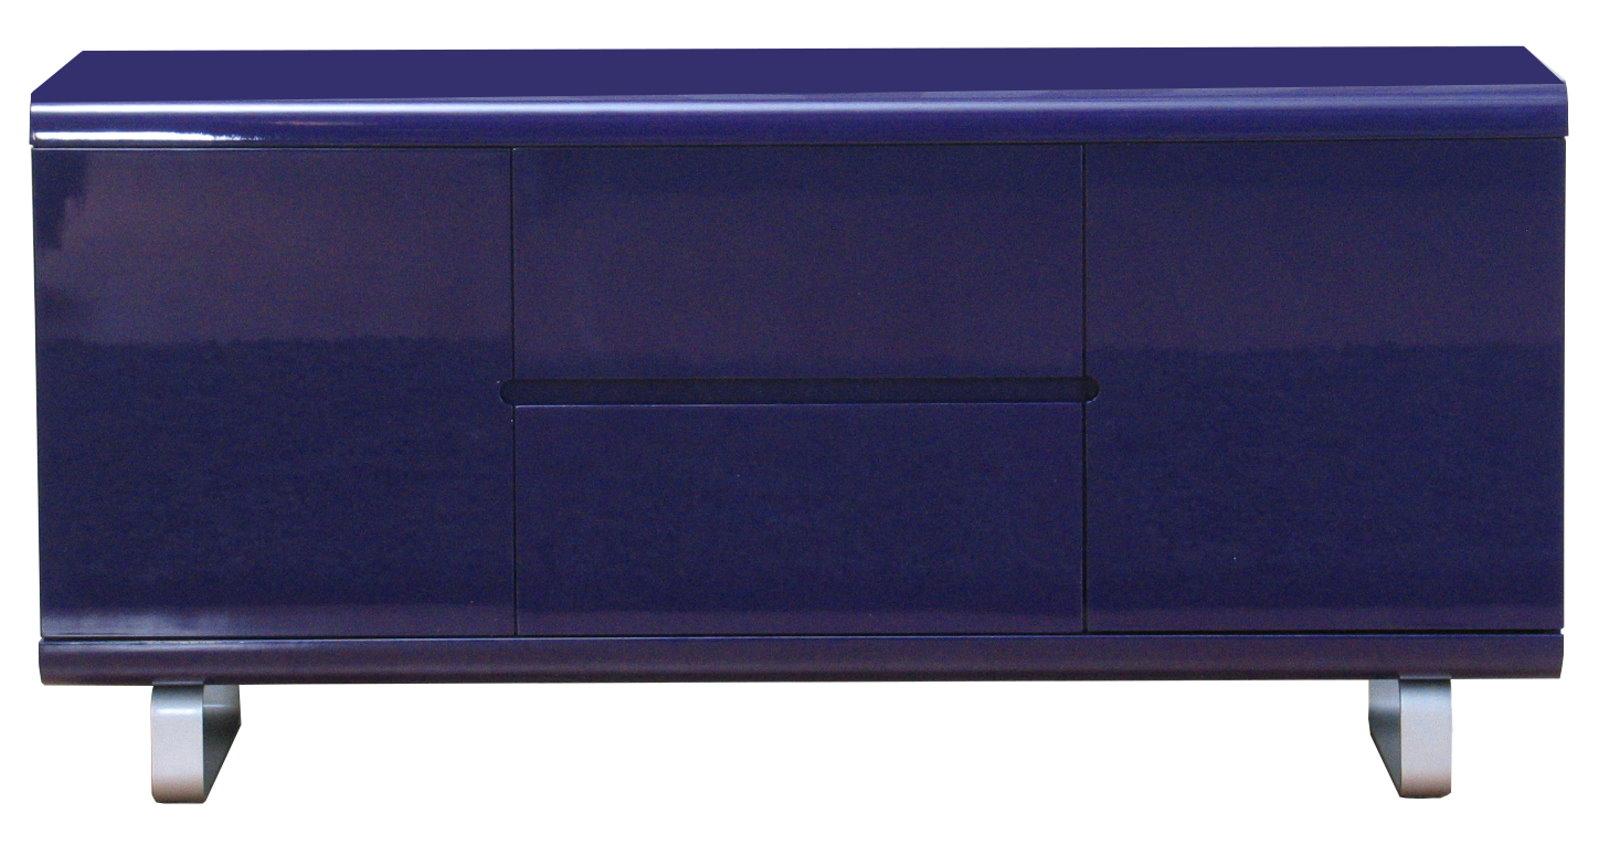 Sideboard spacy kommode anrichte highboard buffet schrank for Sideboard lila hochglanz